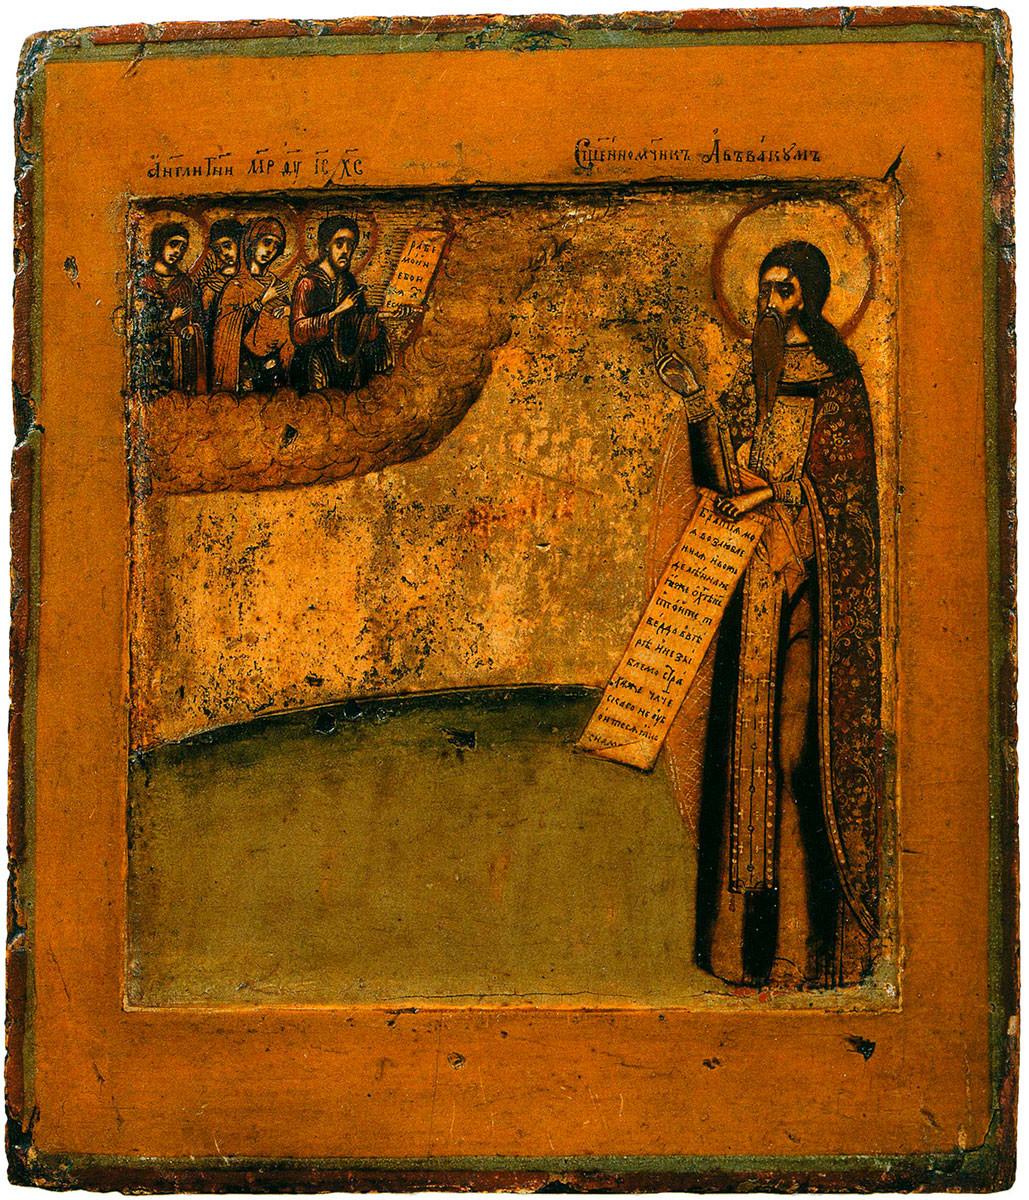 Протопоп Аввакум. Поволжская икона конца XVII — начала XVIII вв.